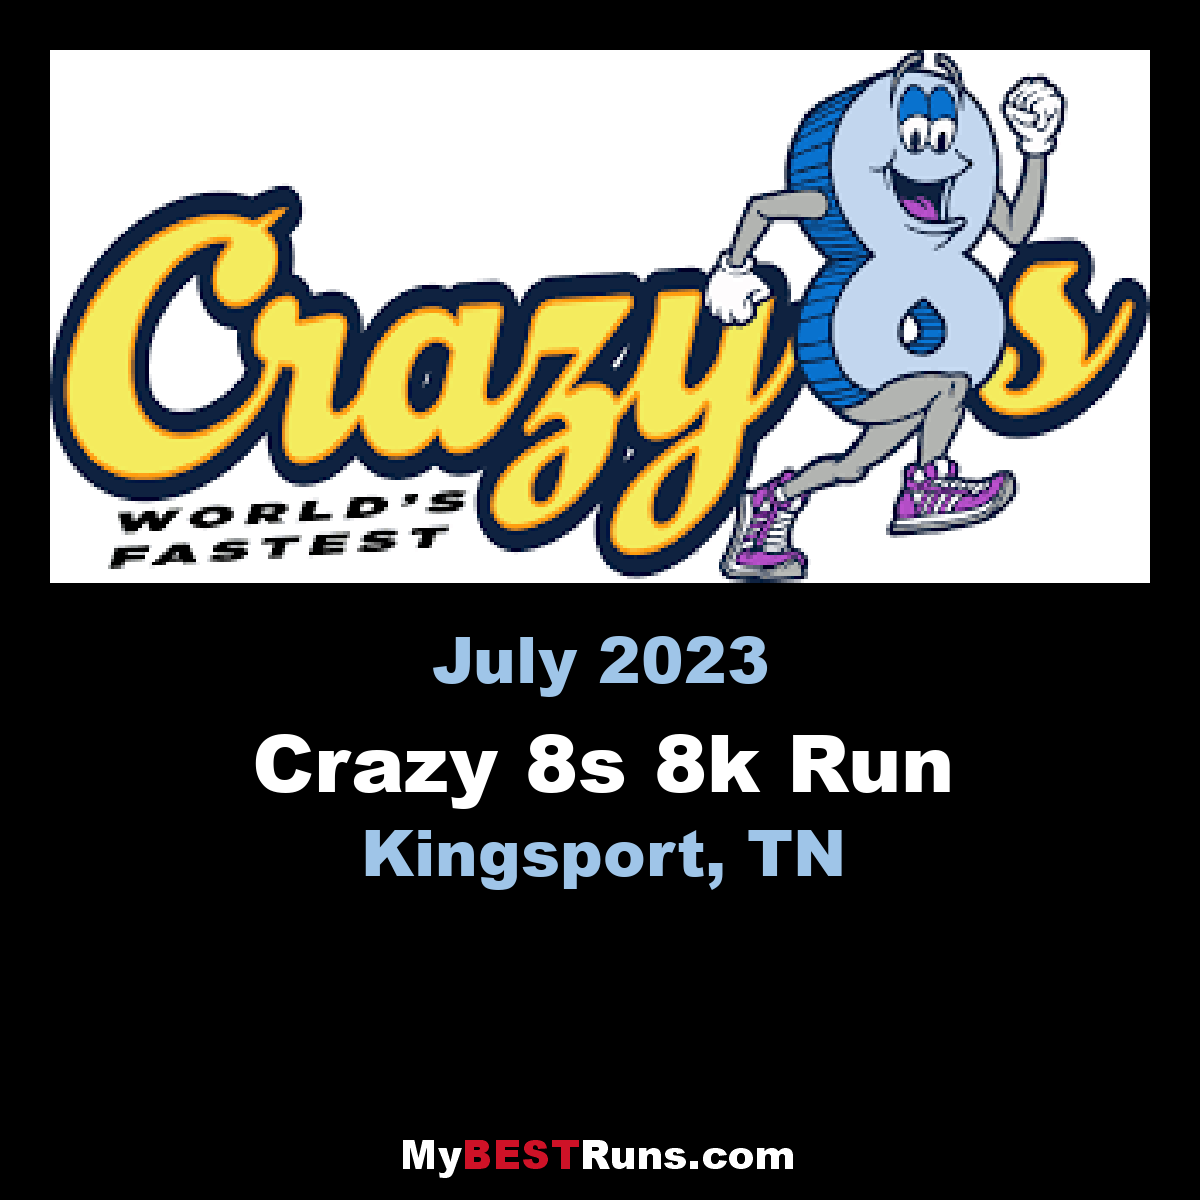 Crazy 8s 8k Run